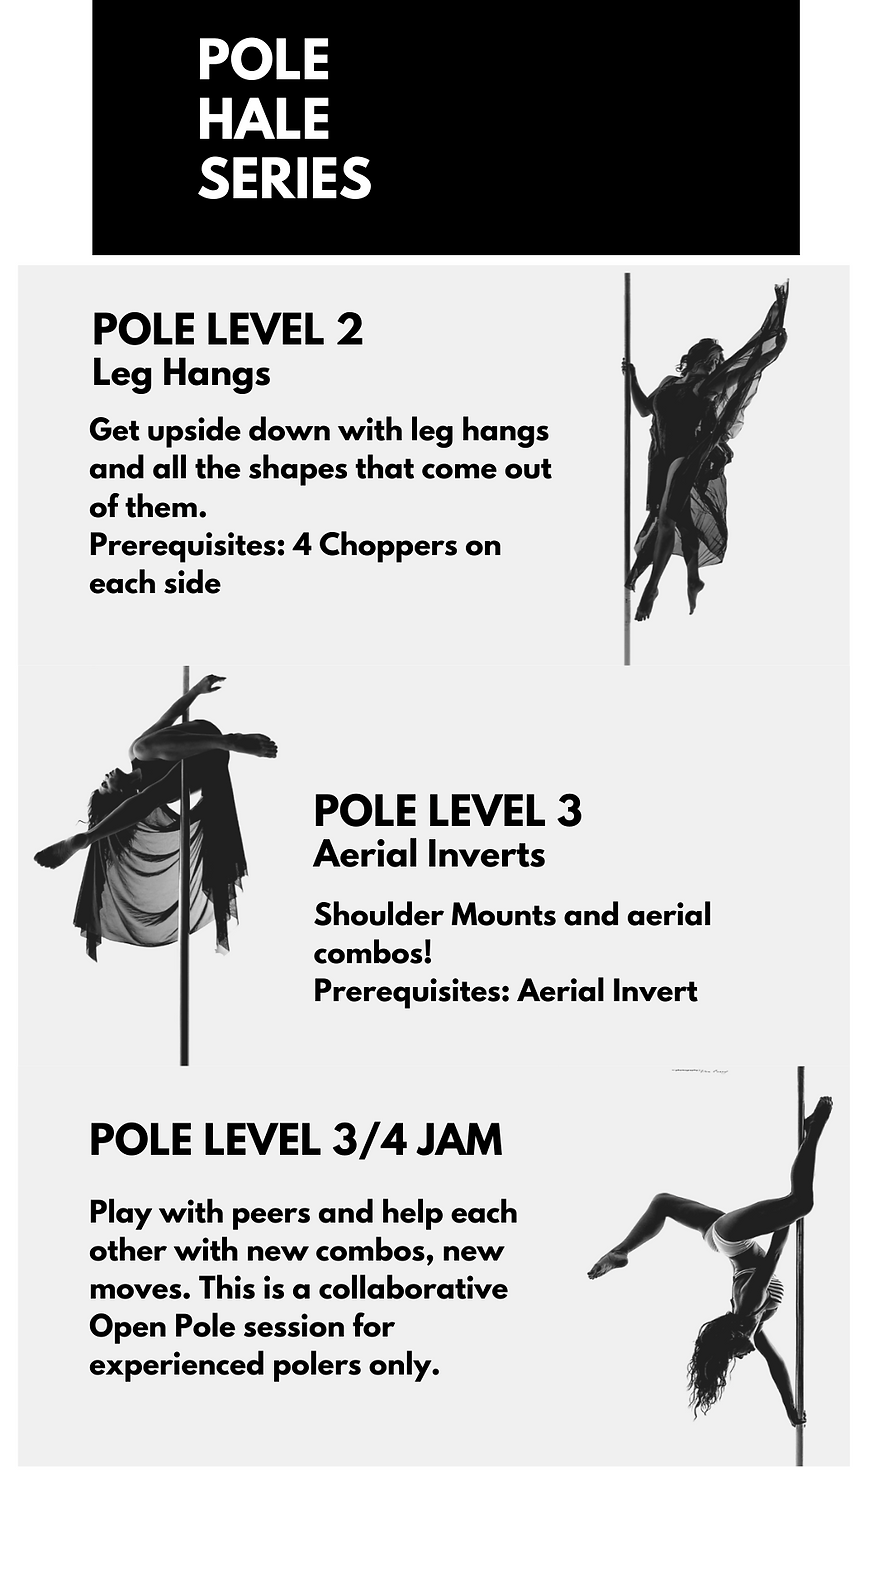 Copy of  POLE HALE Series (2).png